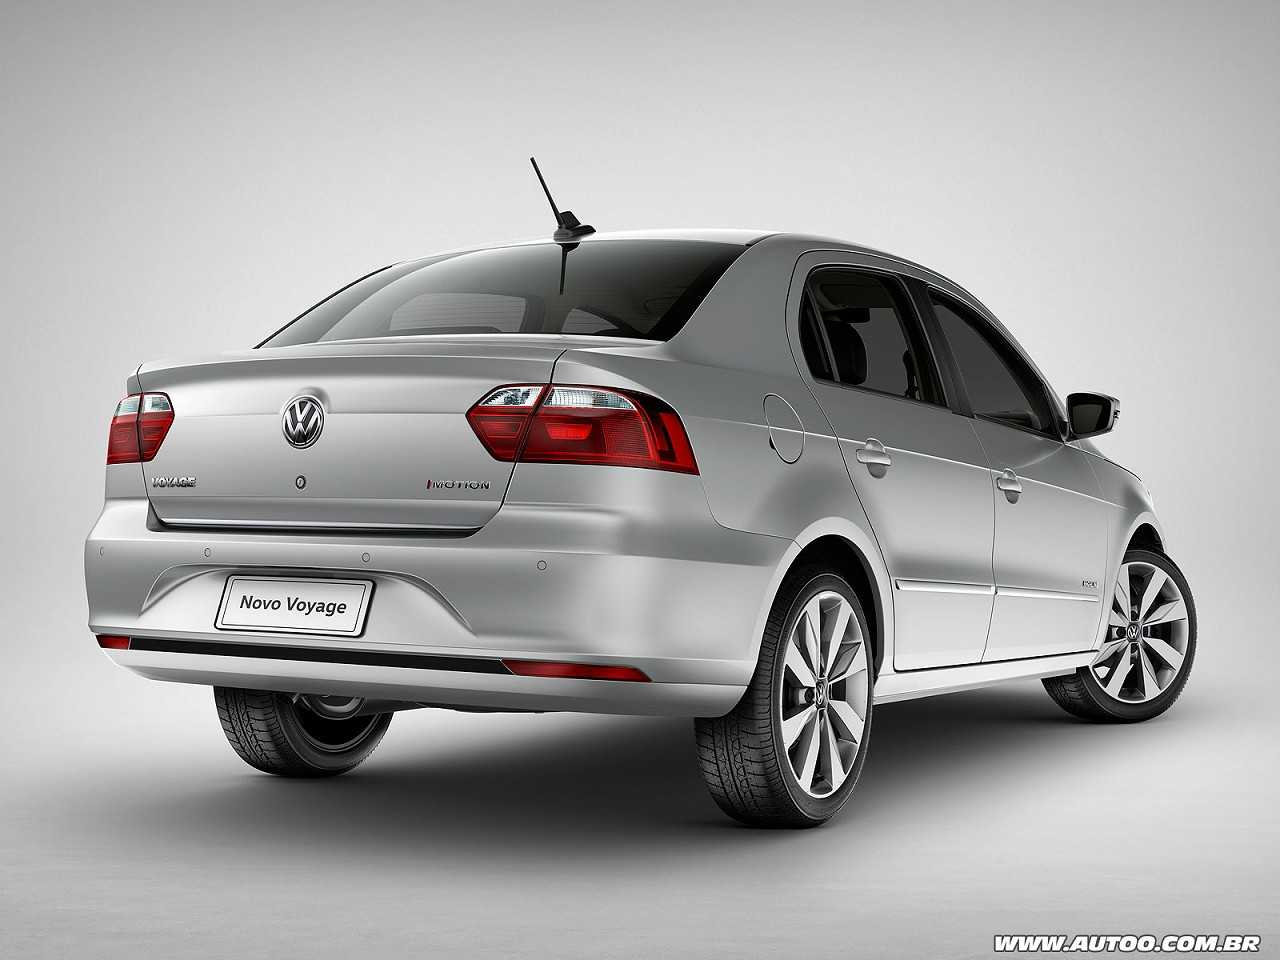 VolkswagenVoyage 2017 - ângulo traseiro